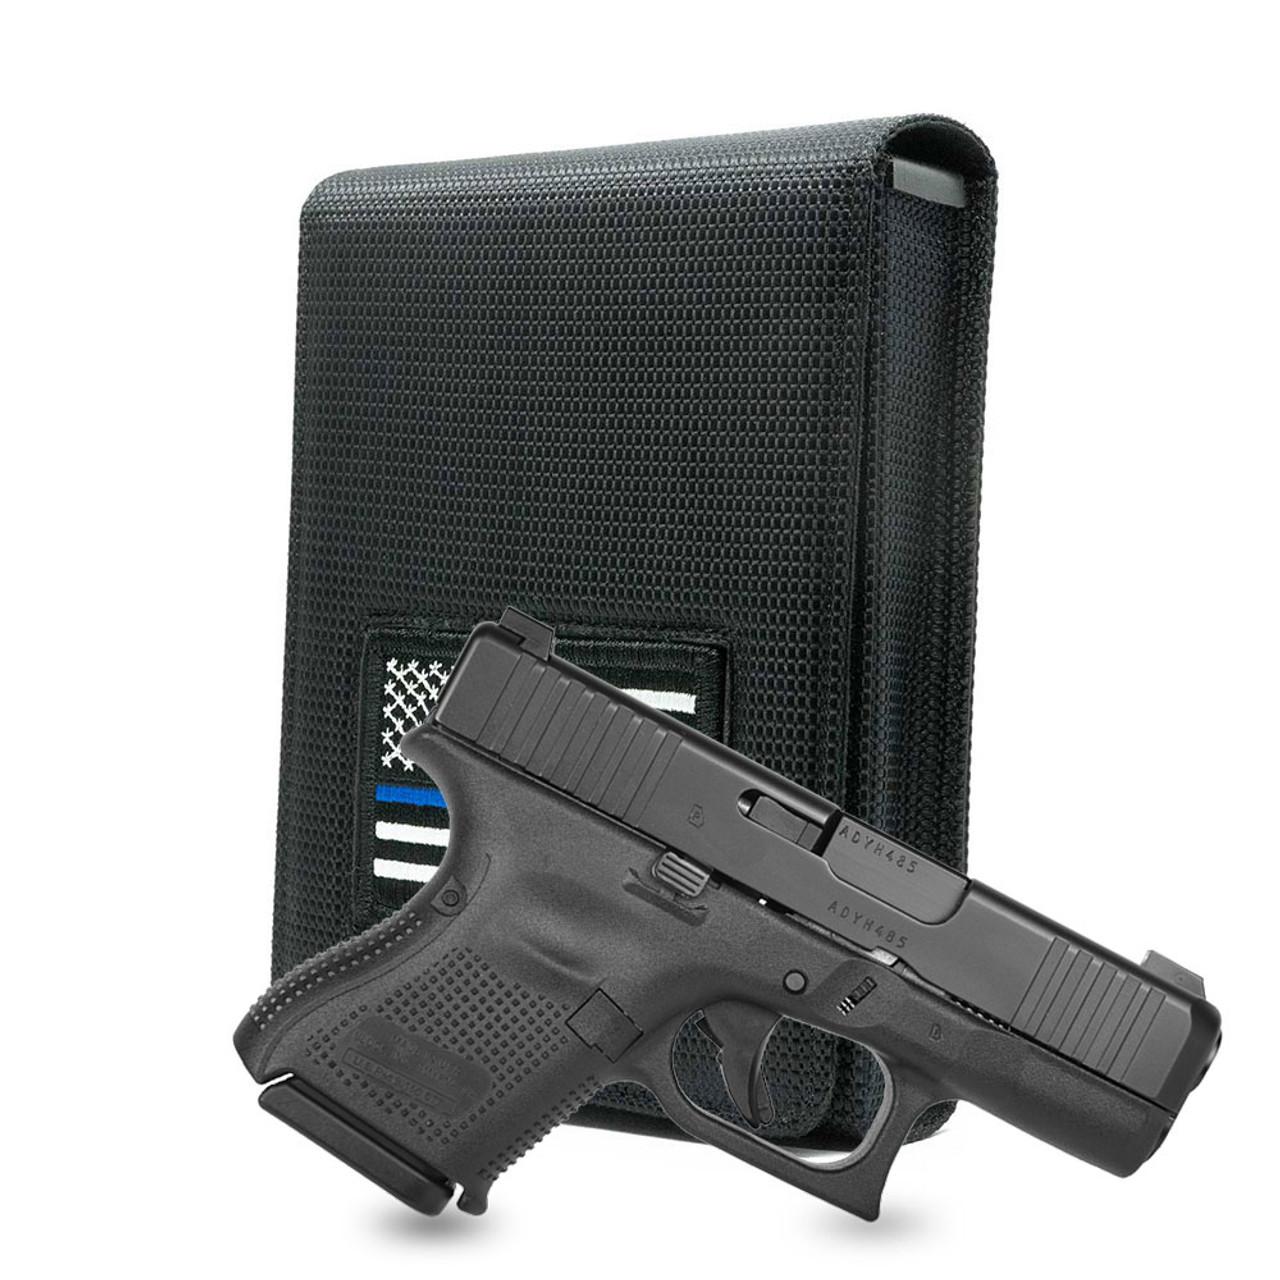 Glock 26 Thin Blue Line Holster